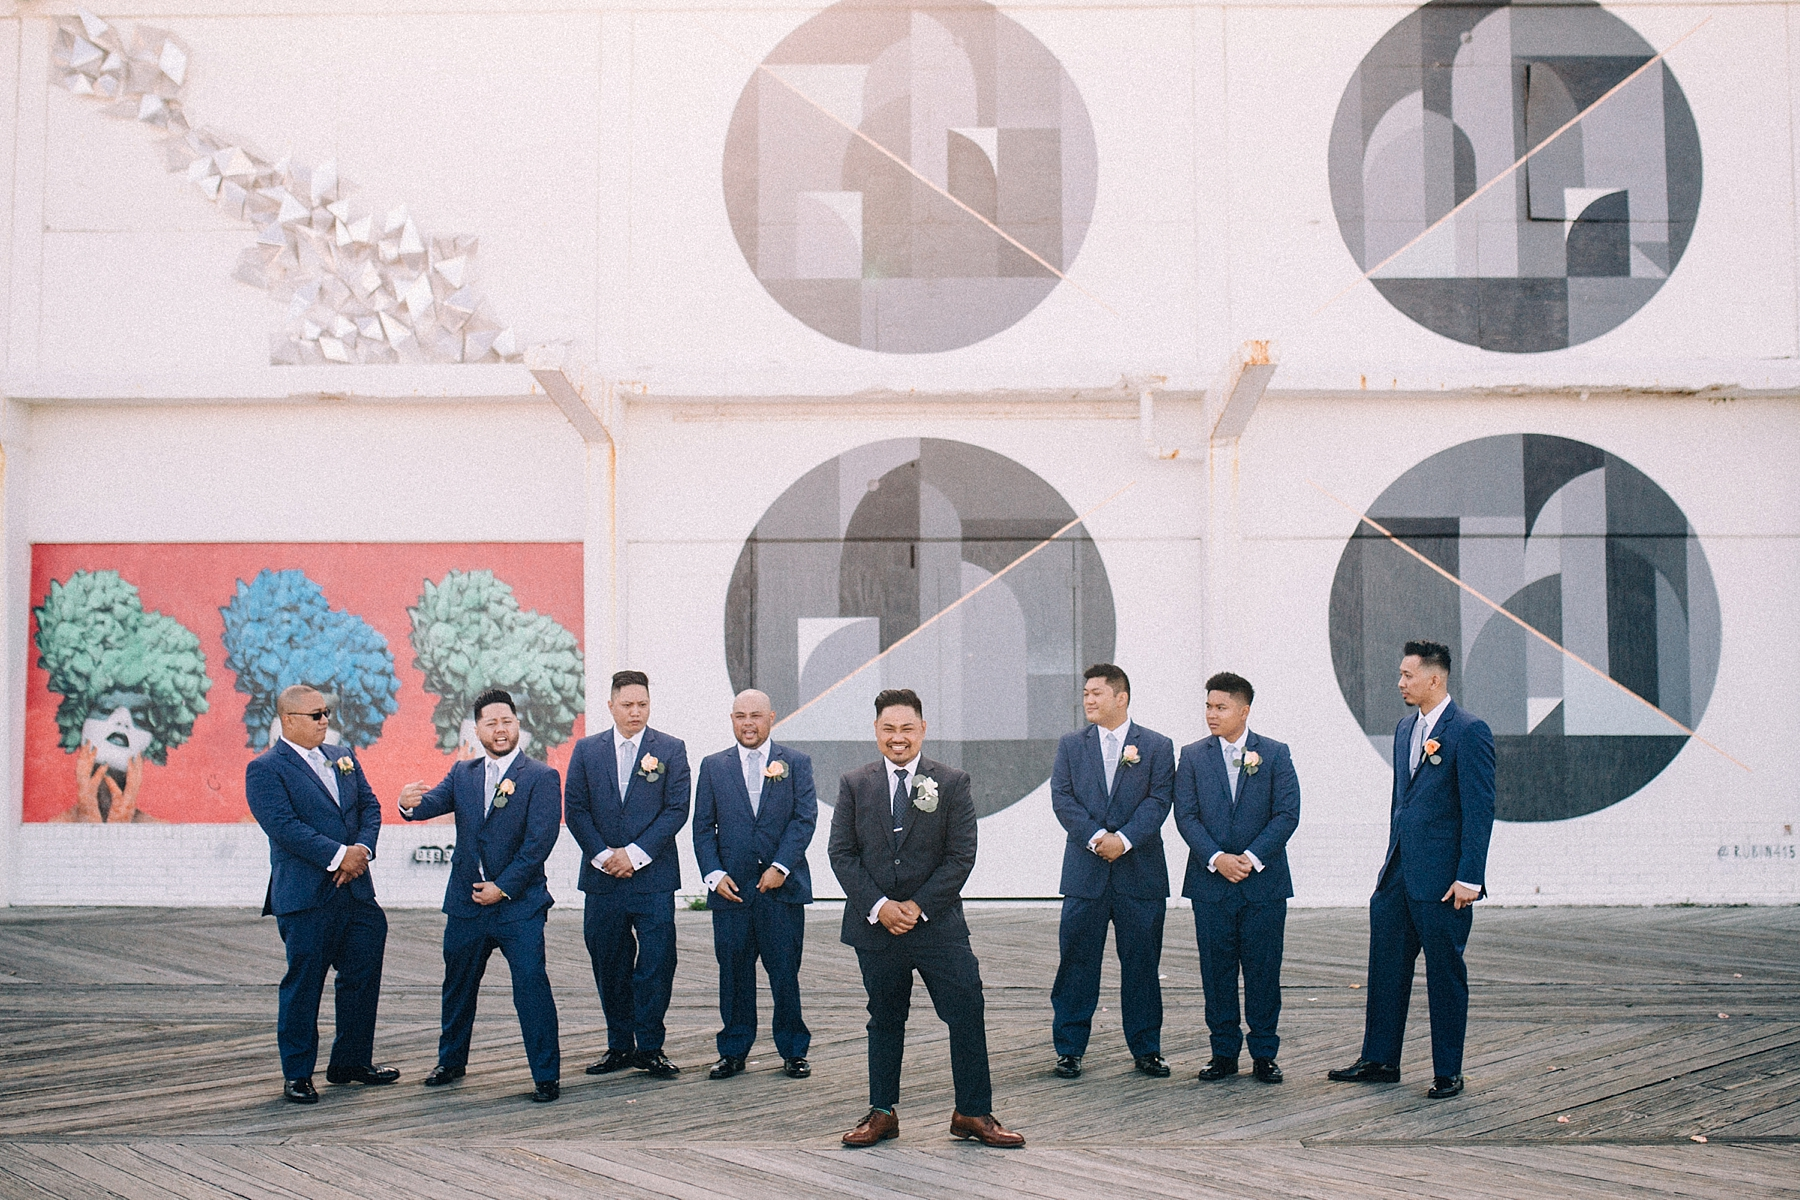 new_jersey_wedding_the_Berkeley_beach_asbury_photographer_0041.jpg